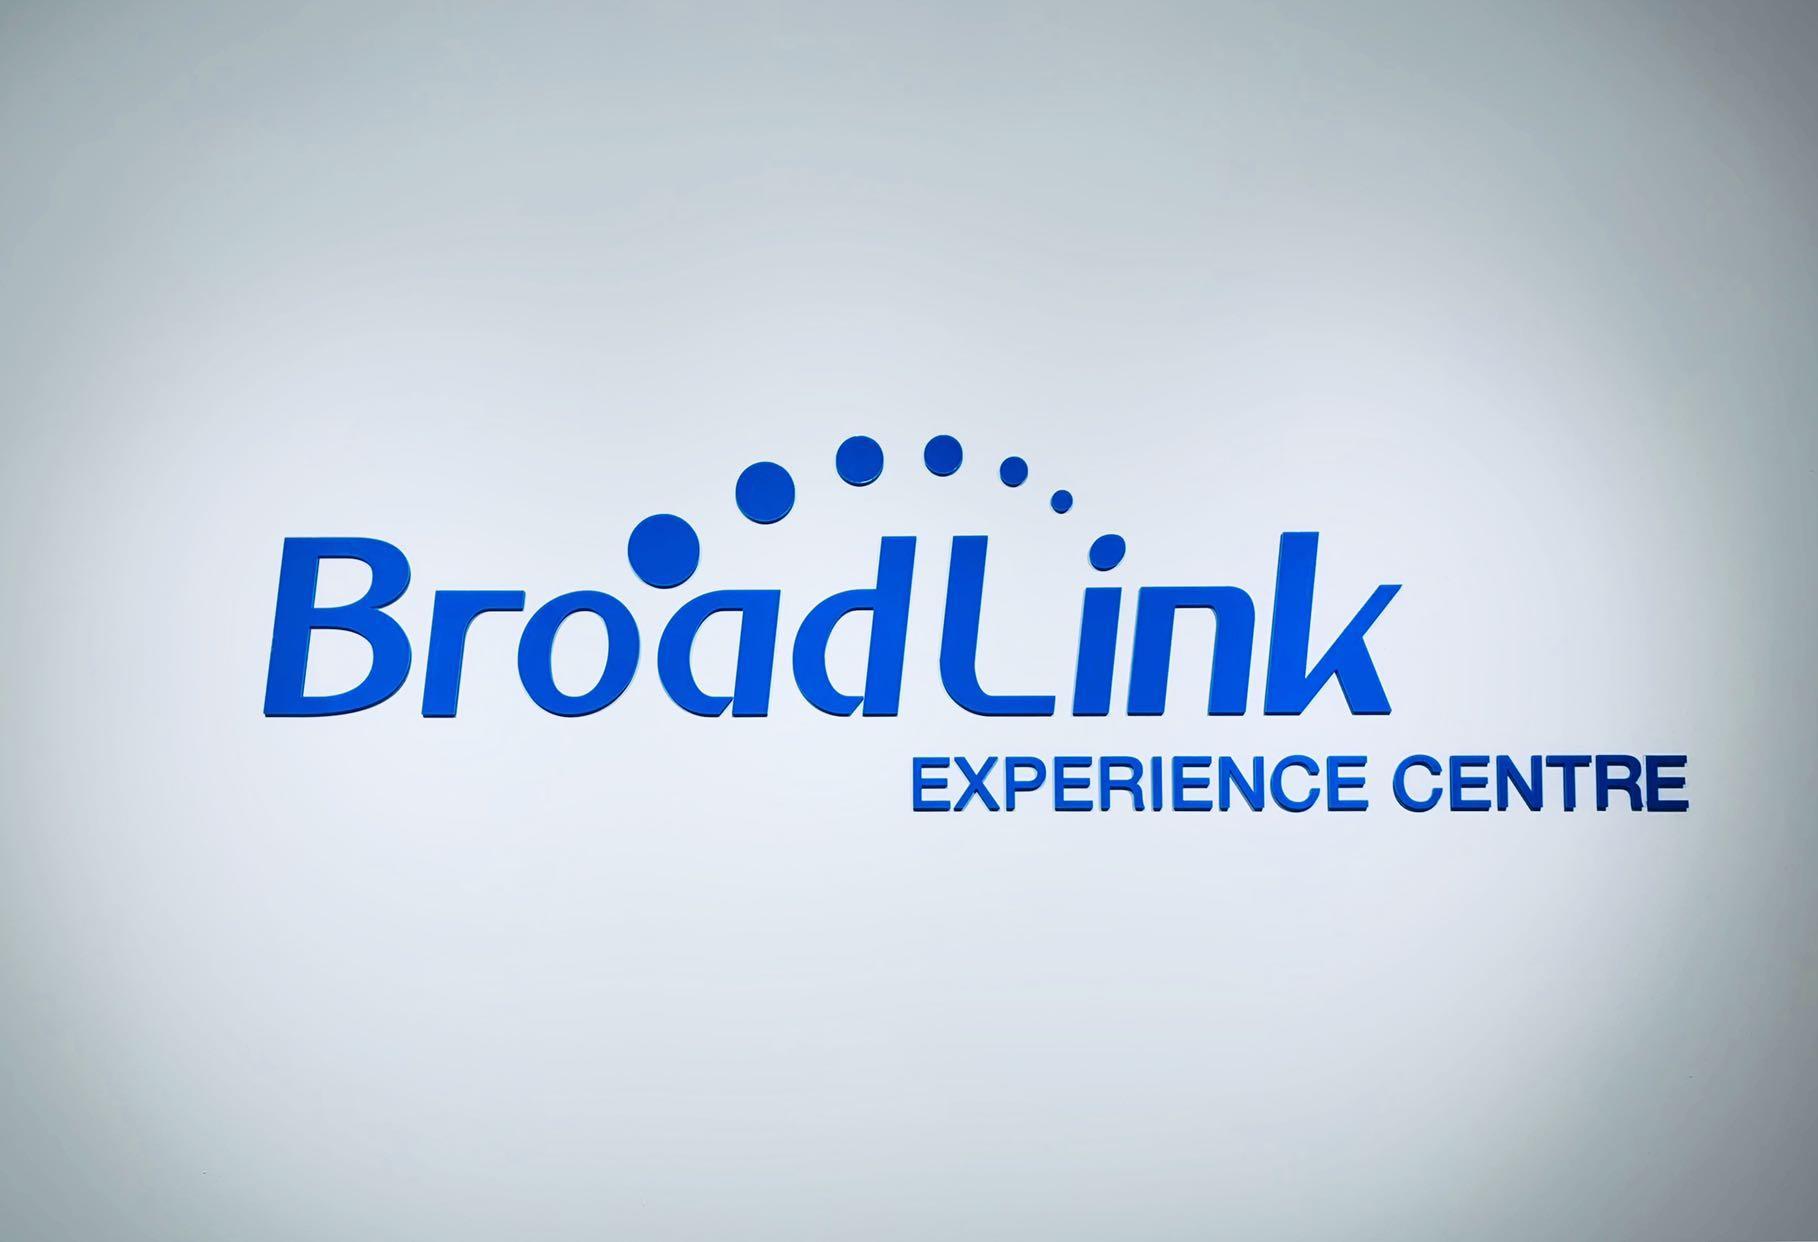 Broadlink Experience Centre - Broadlink Singapore - Smart Home Automation